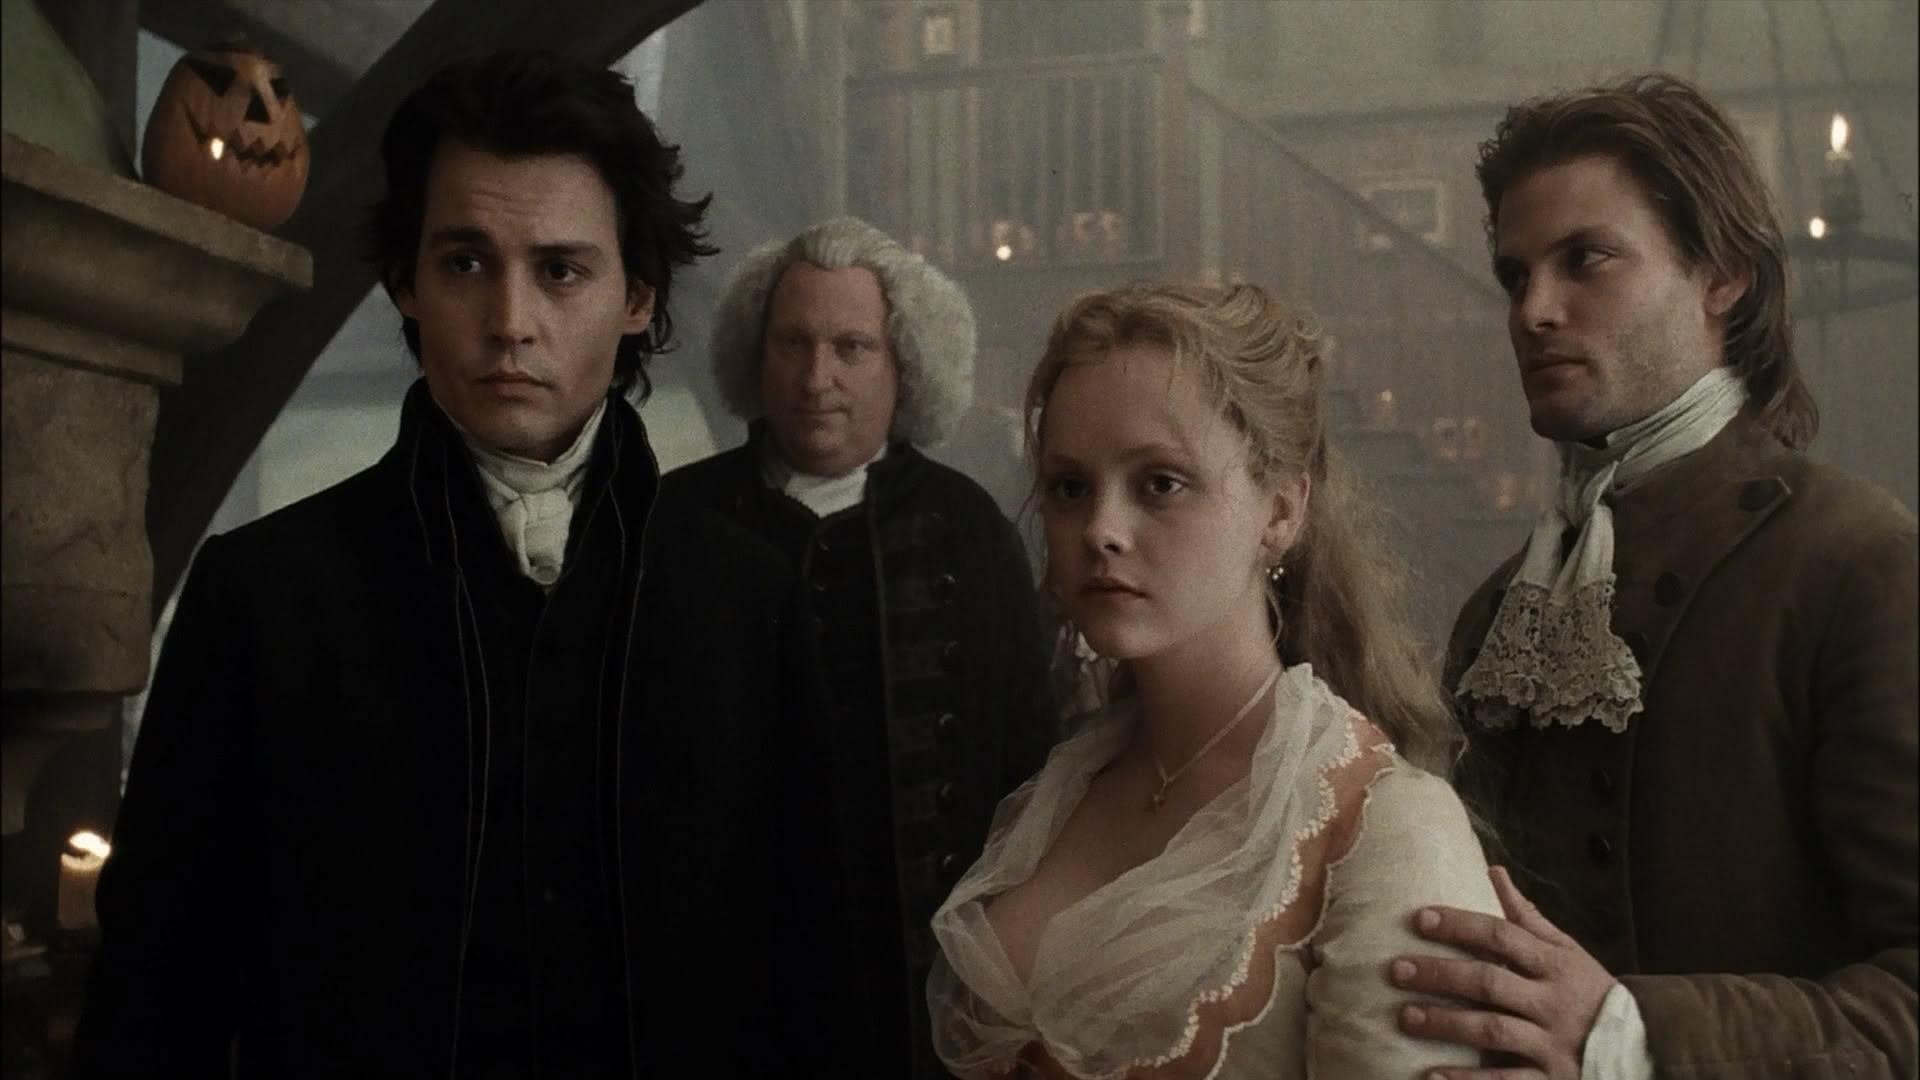 (l to r) Ichabod Crane (Johnny Depp), Reverend Steenwyck (Jeffrey Jones), Katrina Van Tassel (Christina Ricci) and Brom Brunt (Casper Van Dien) in Sleepy Hollow (1999)